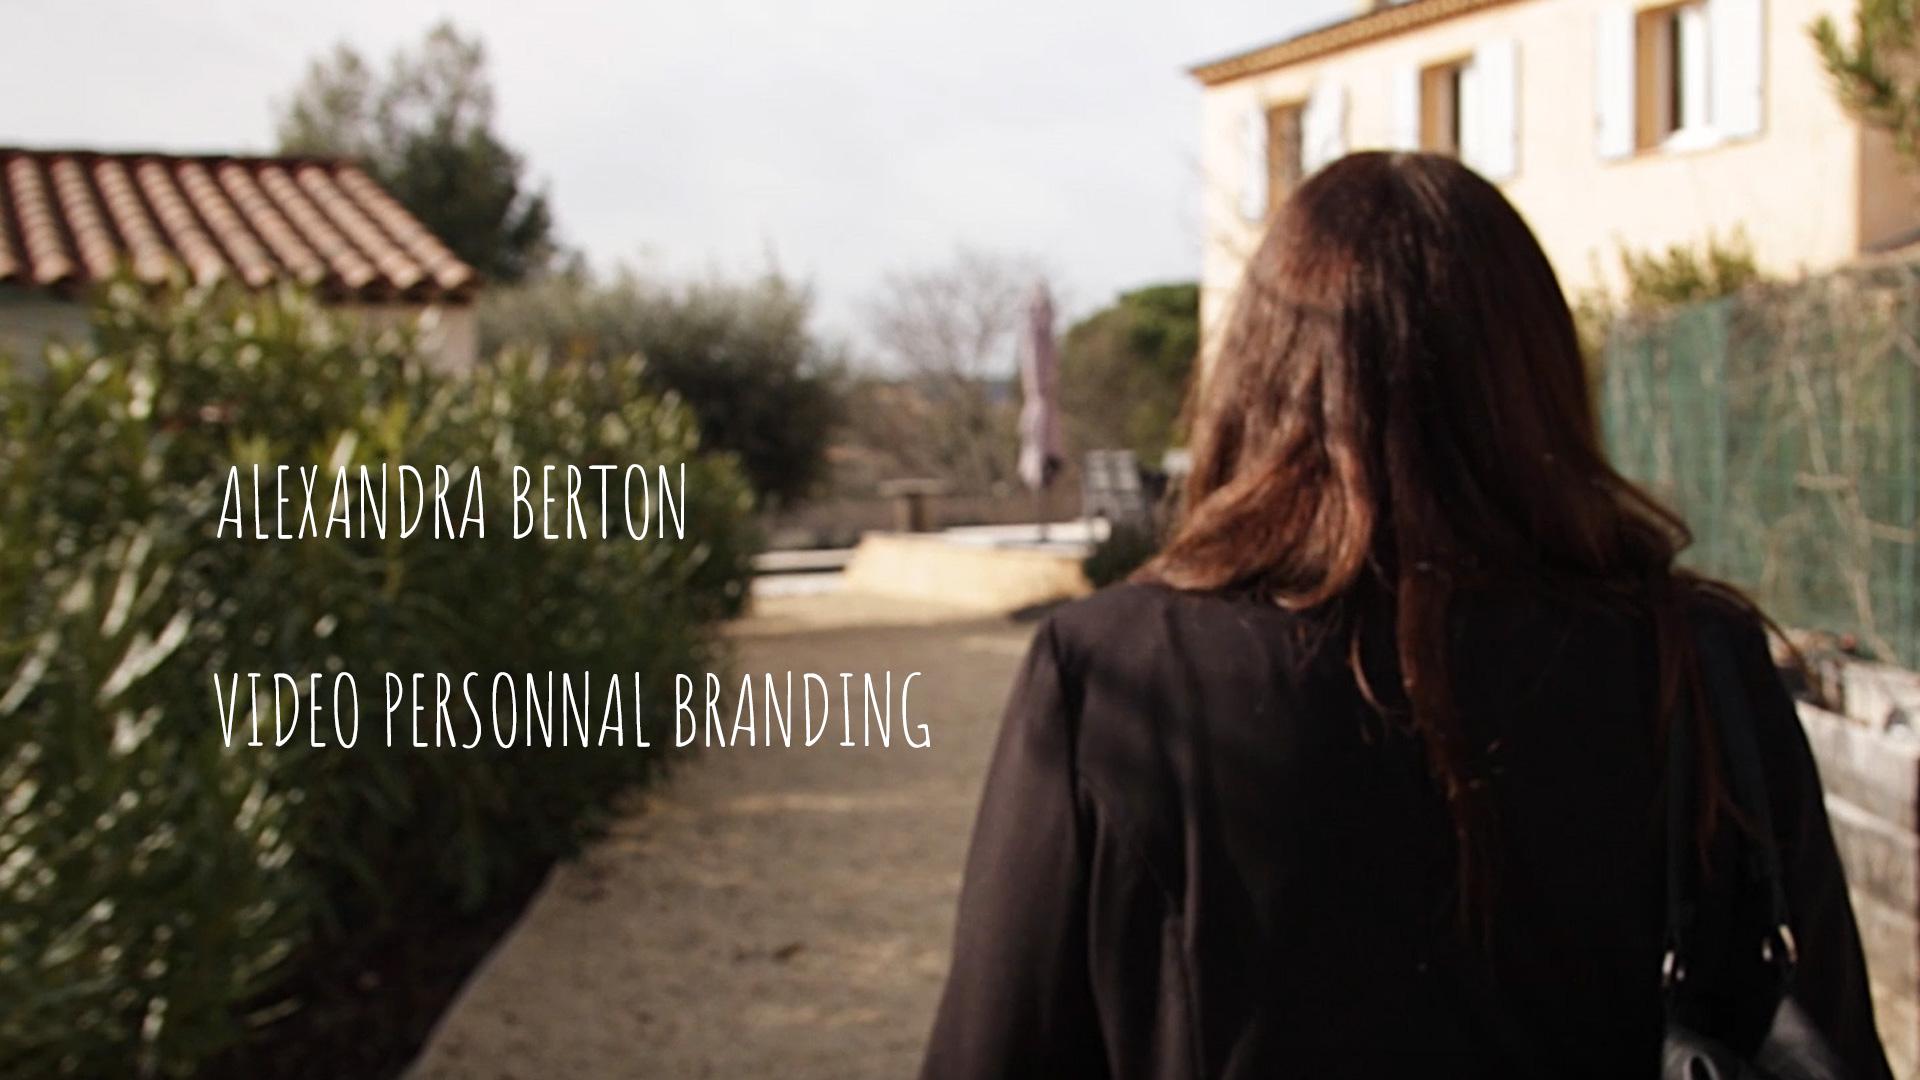 video personnal branding